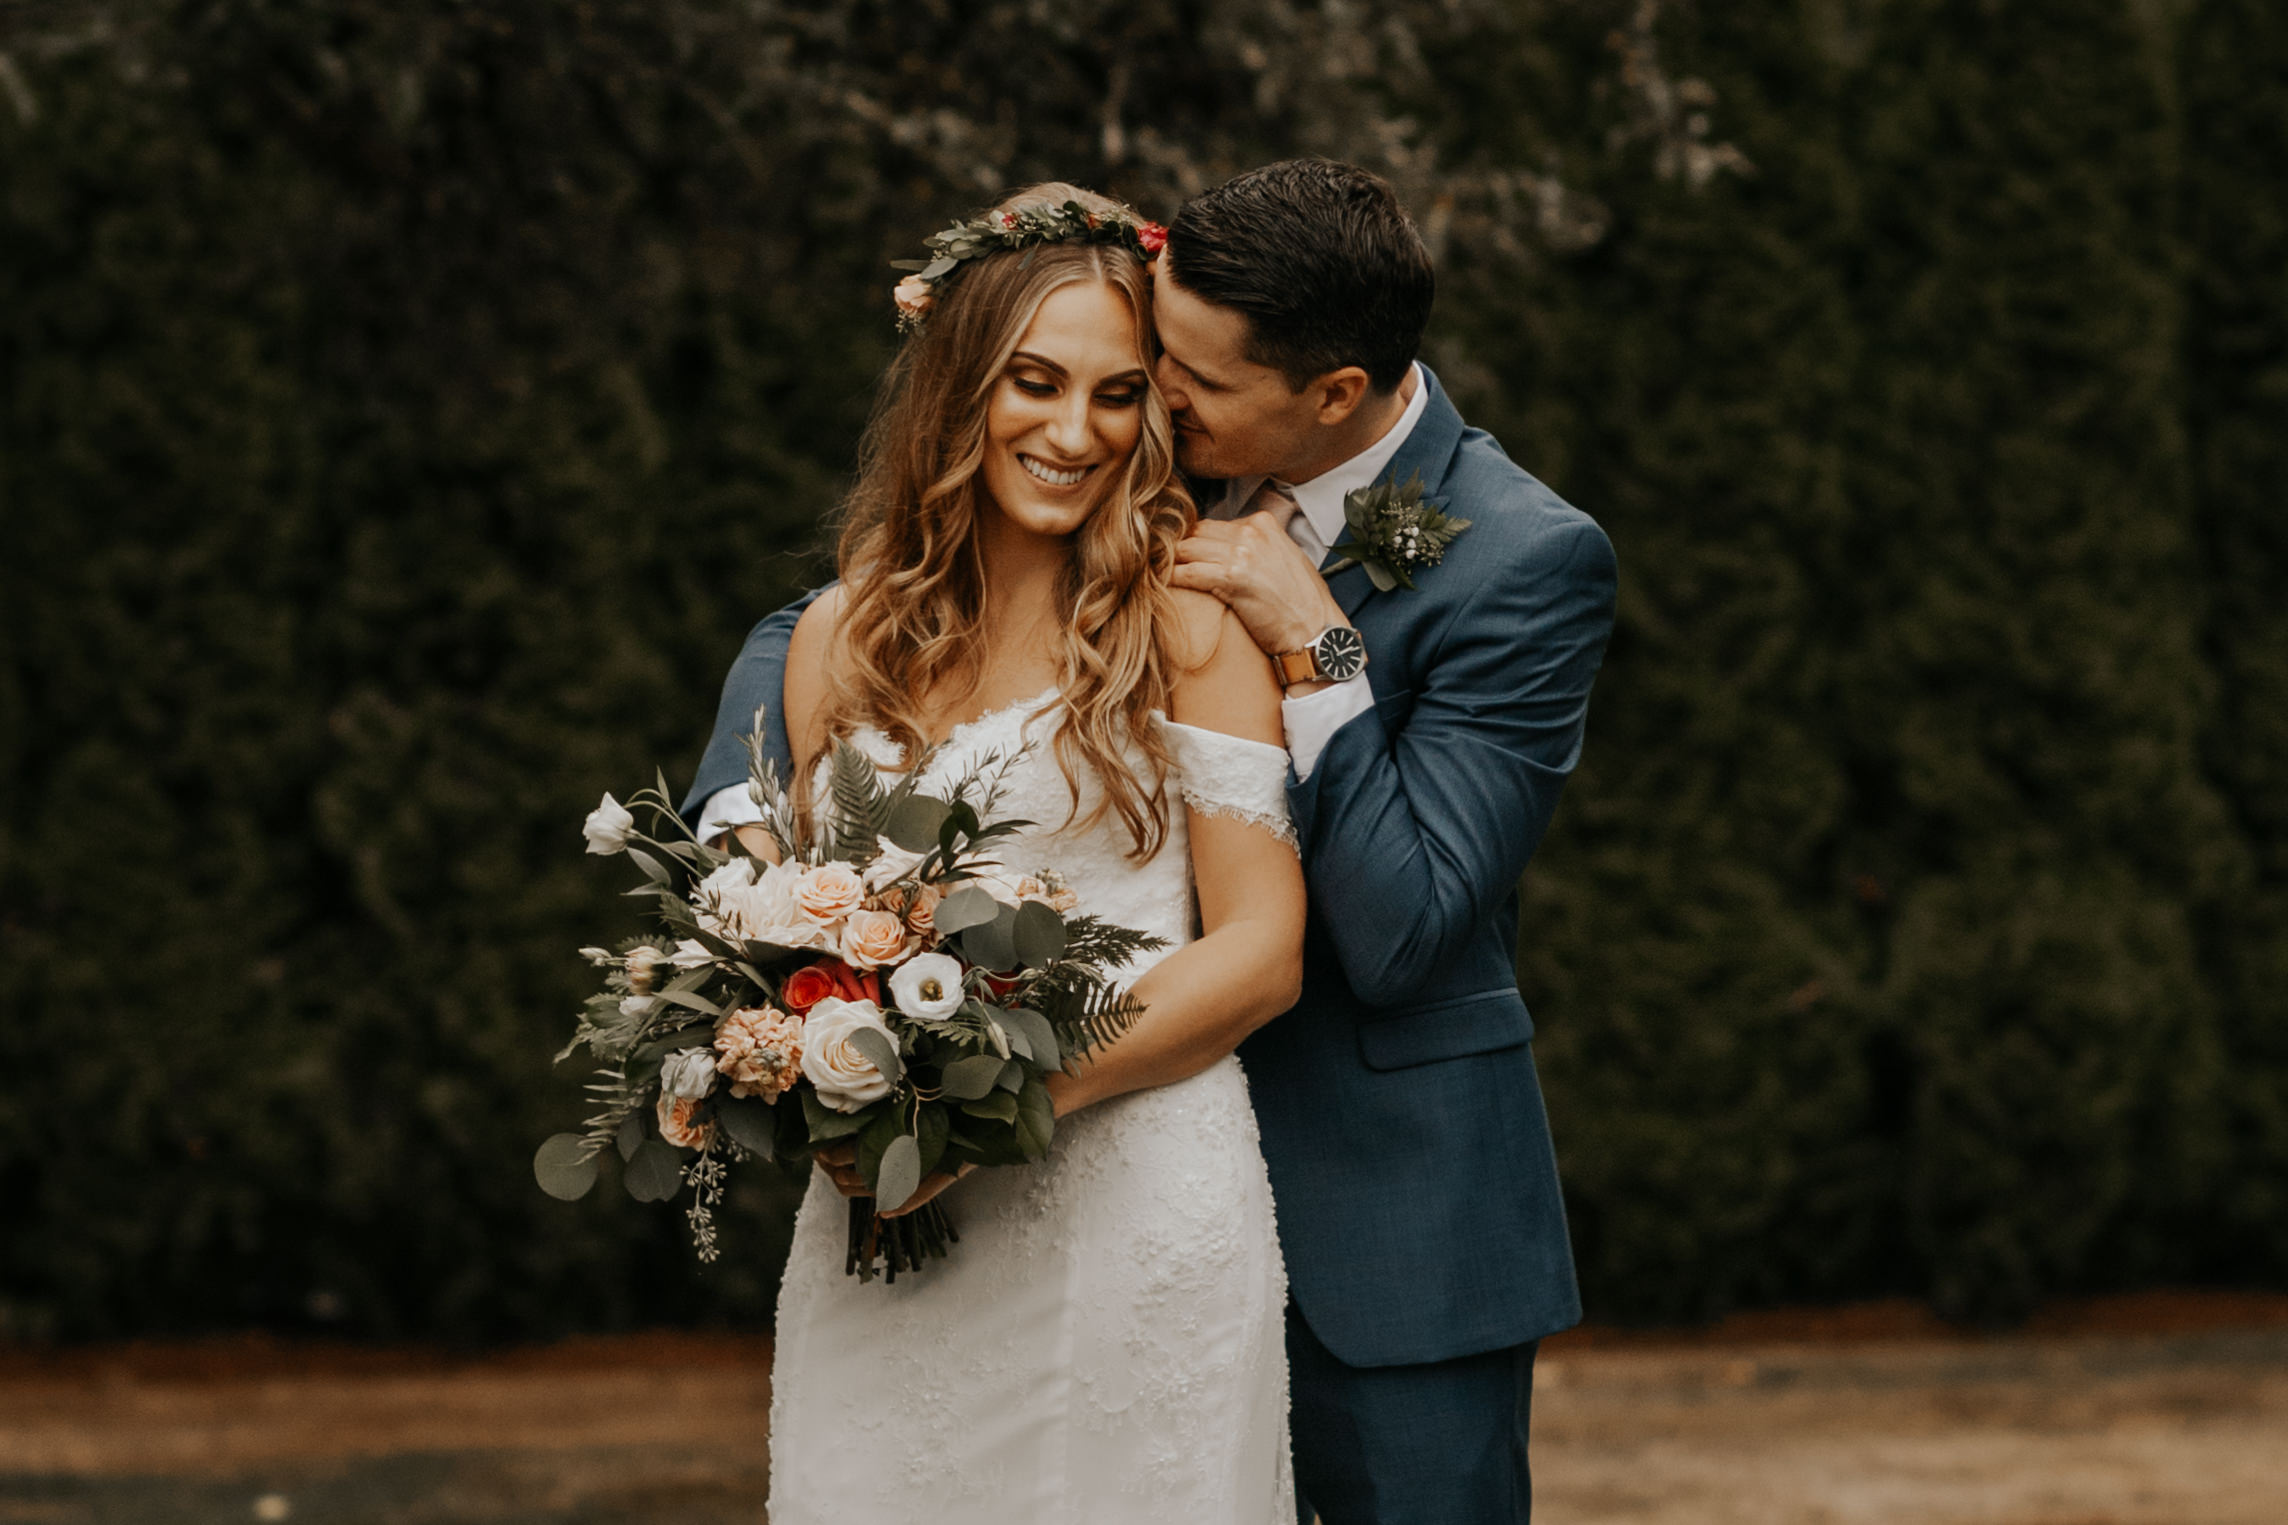 ginapaulson_jakitrevor_wedding-172.jpg